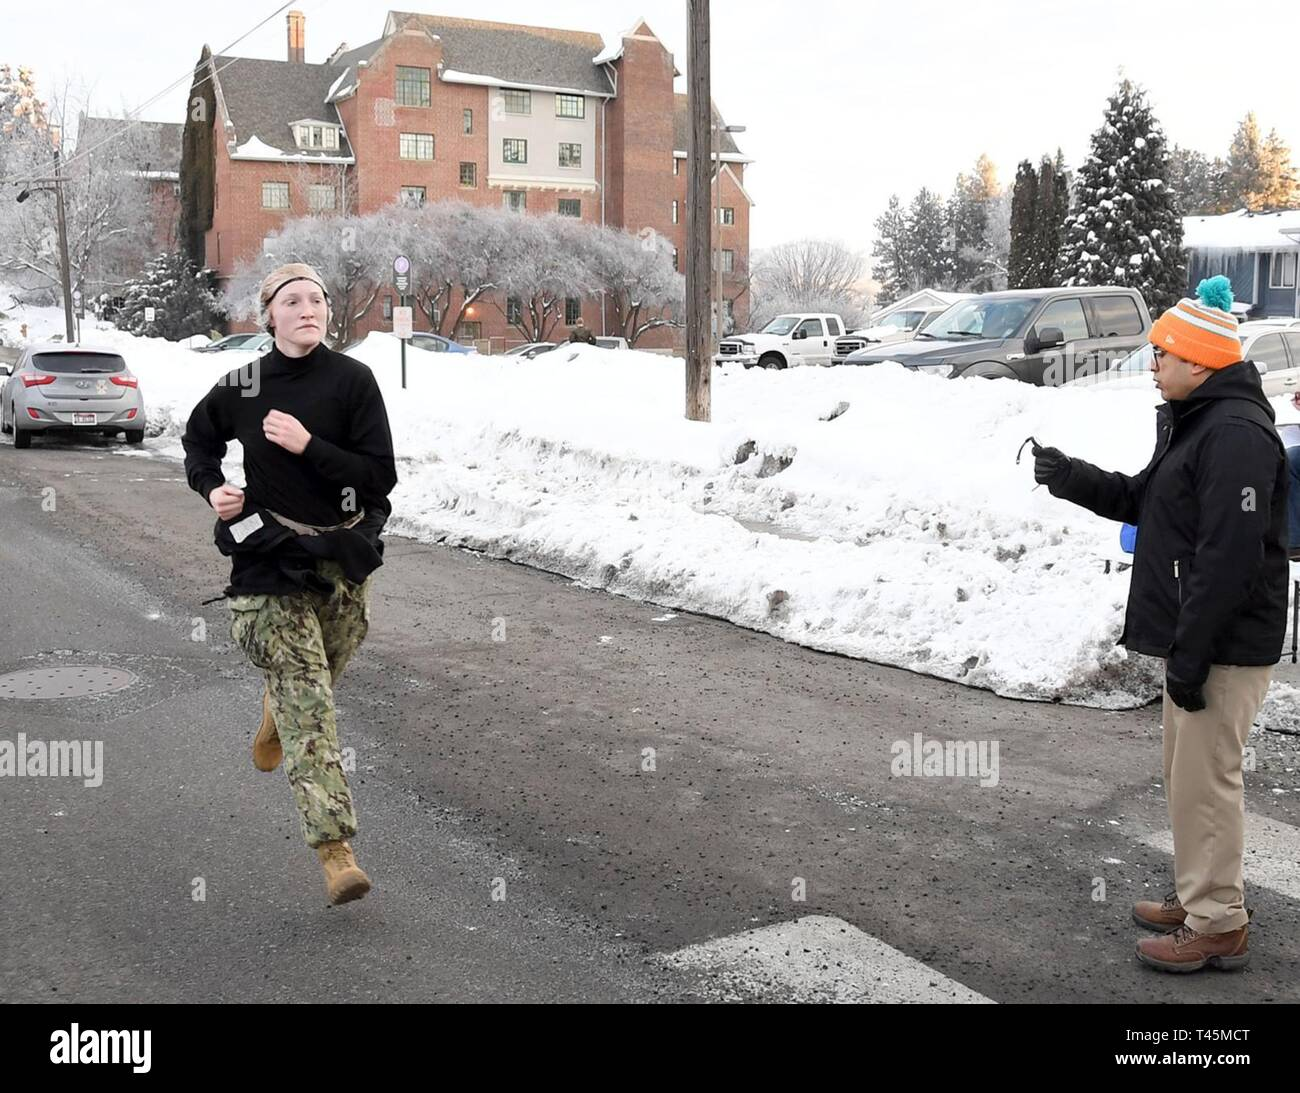 MOSCOW, Idaho – Oregon State University (OSU) Naval Reserve